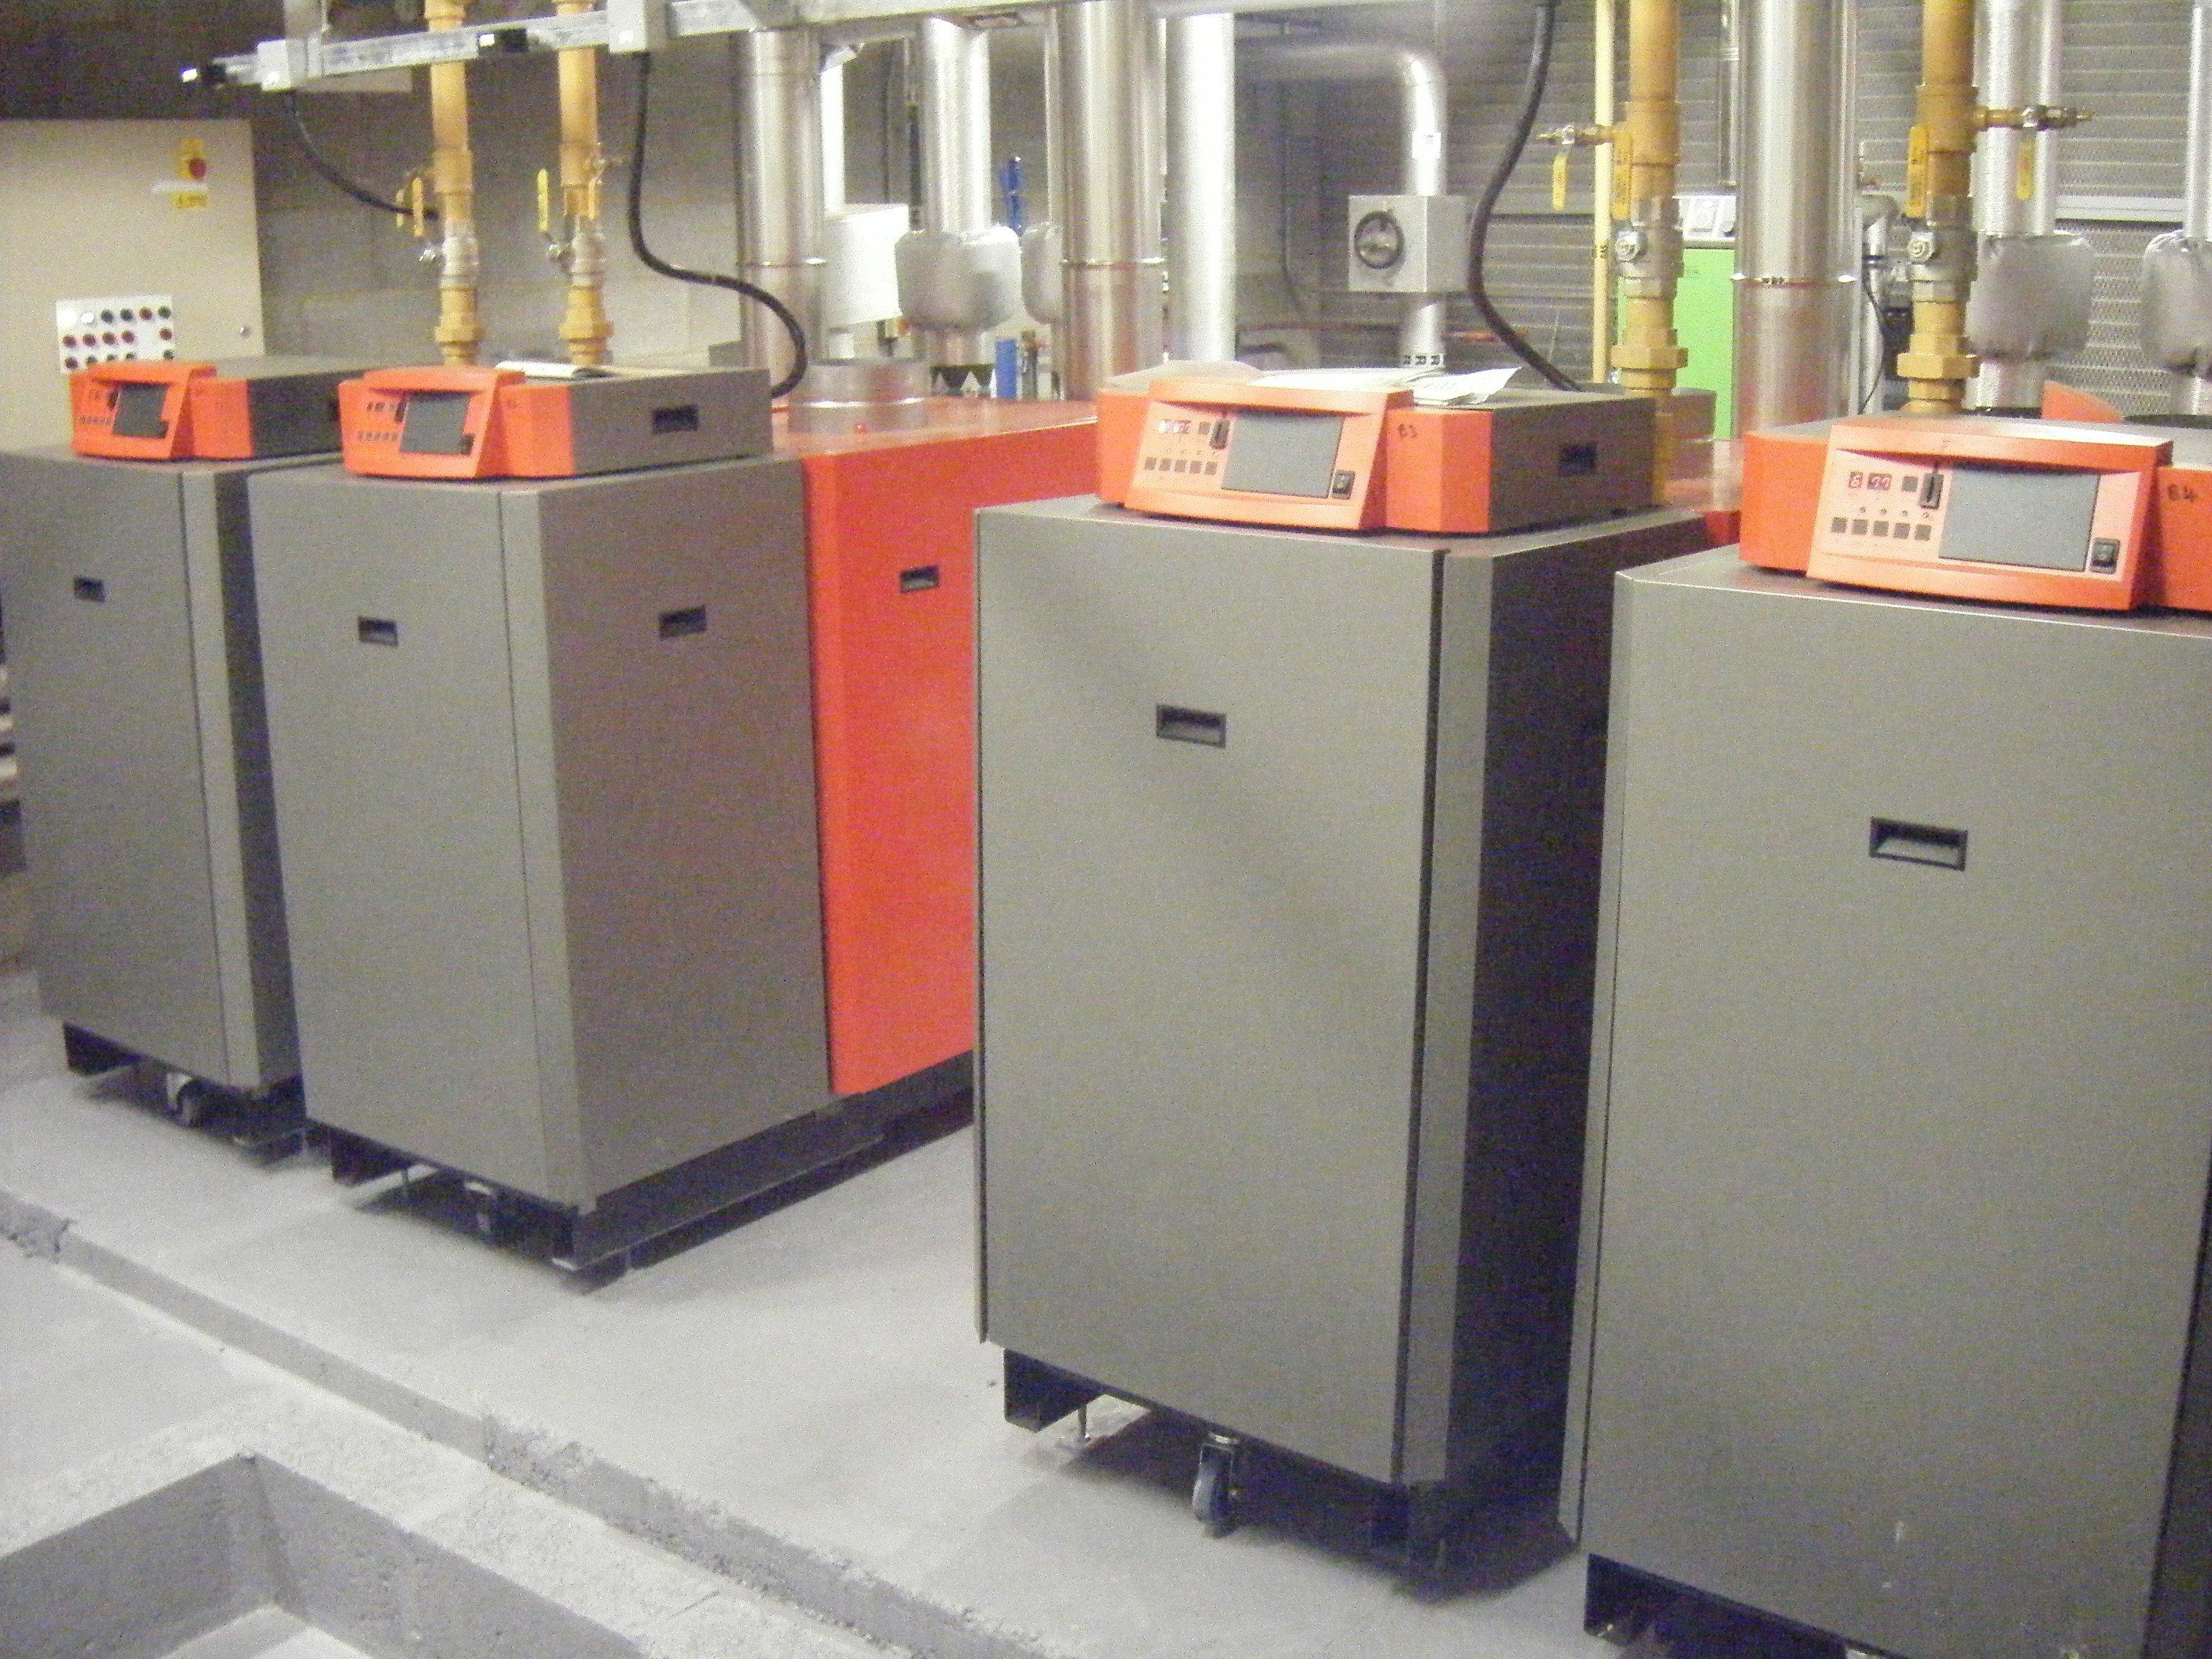 Commercial/industrial boiler room installation